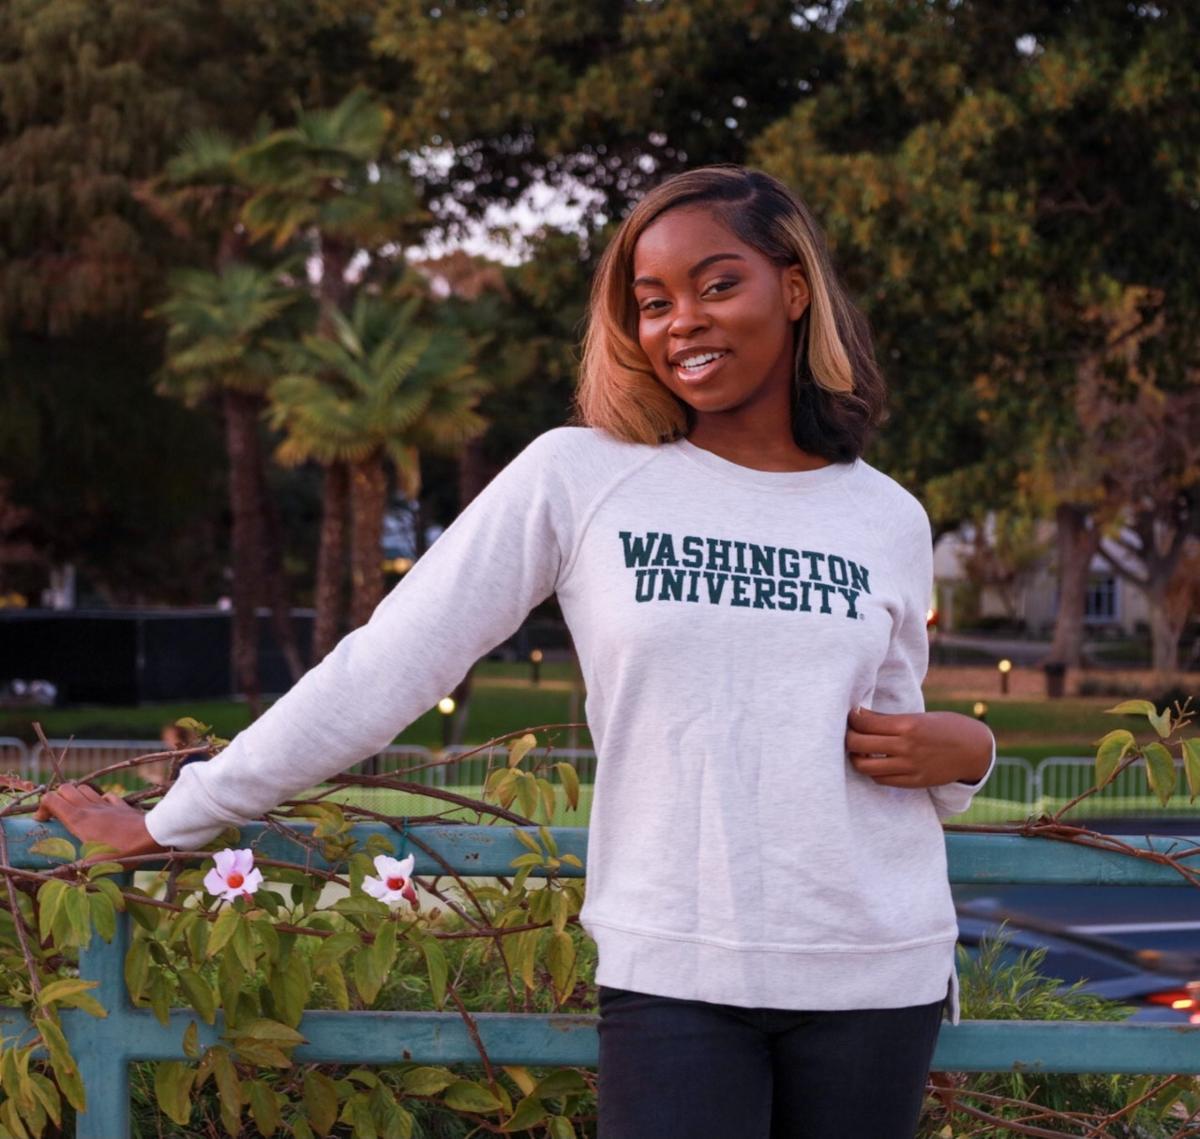 Jai-Laan Blackman will attend Washington University in the Fall!